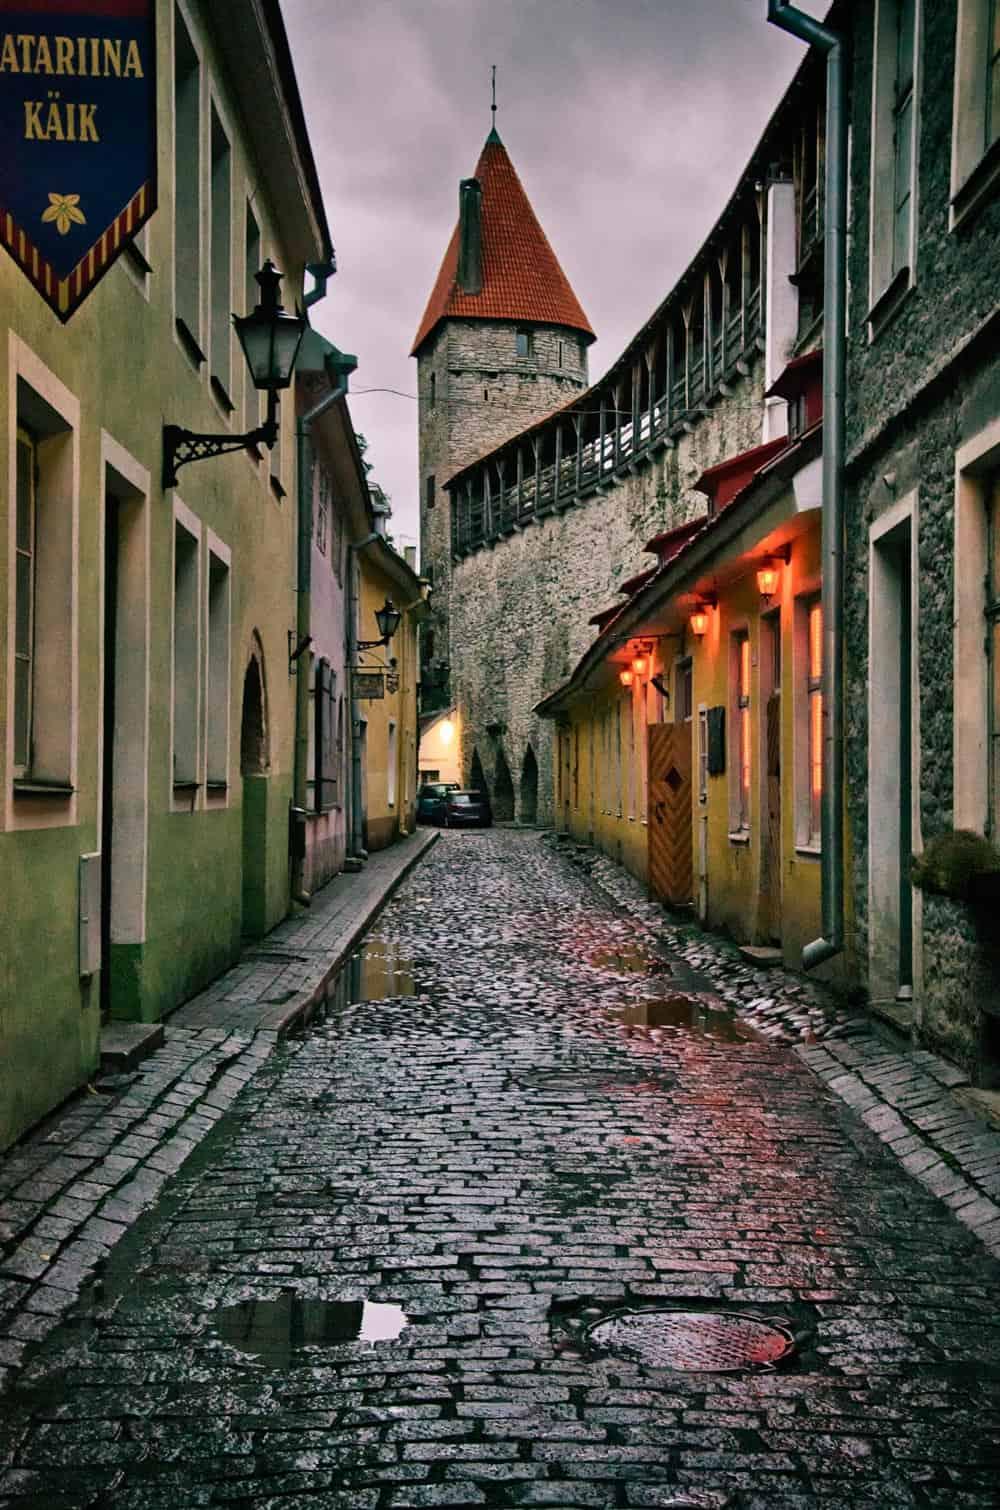 Watchtower Overlooking Alley in Old Town Tallinn, Estonia